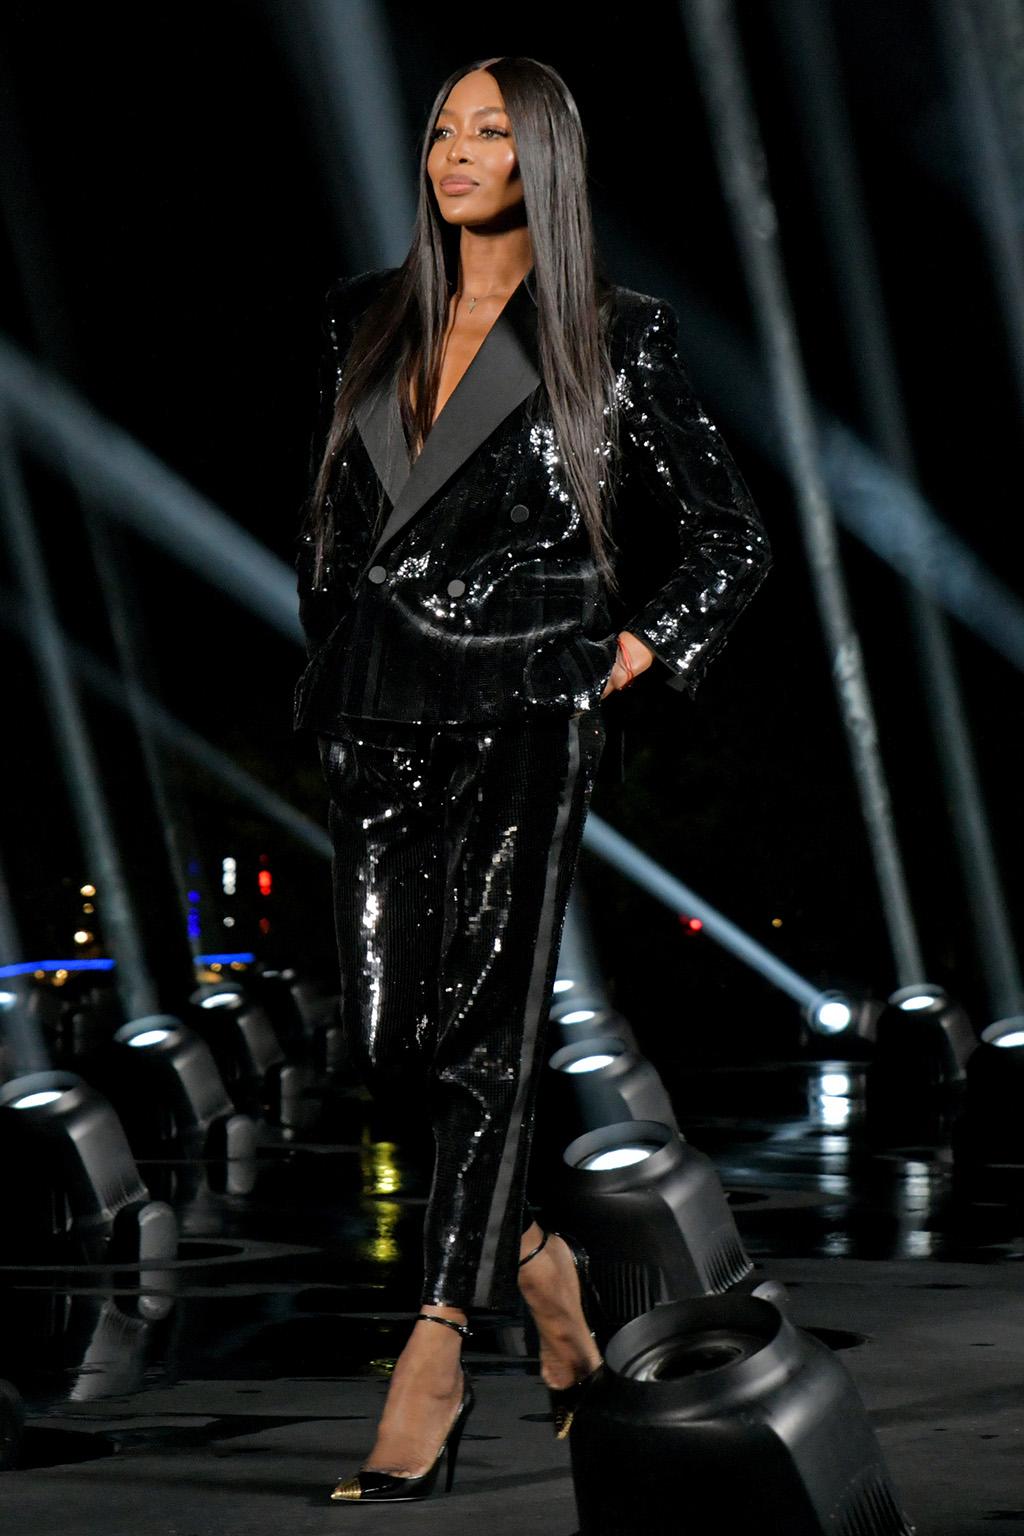 Naomi Campbell on the catwalkSaint Laurent show, Runway, Spring Summer 2020, Paris Fashion Week, France - 24 Sep 2019